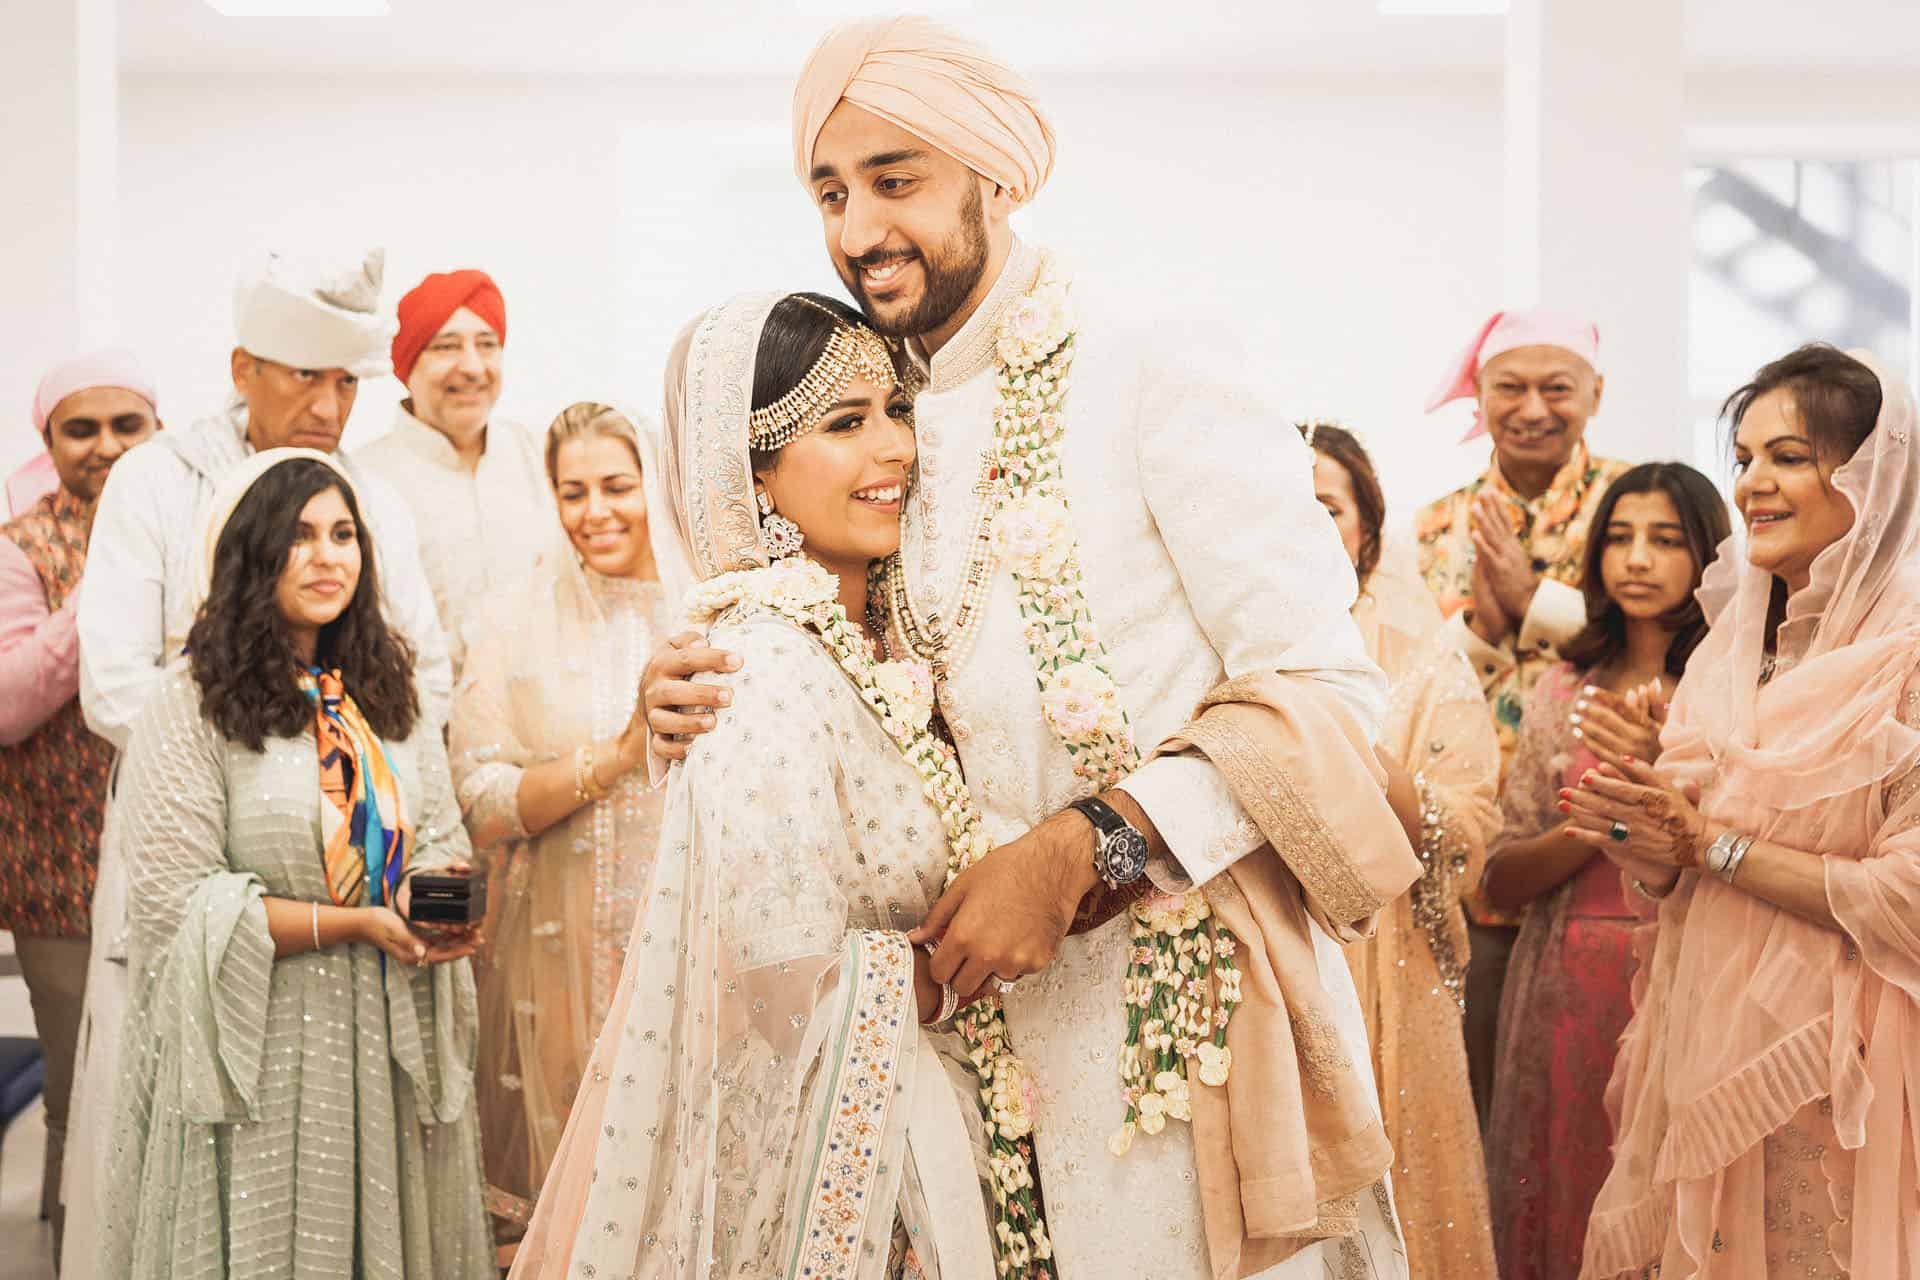 central gurdwara intimate sikh wedding photos